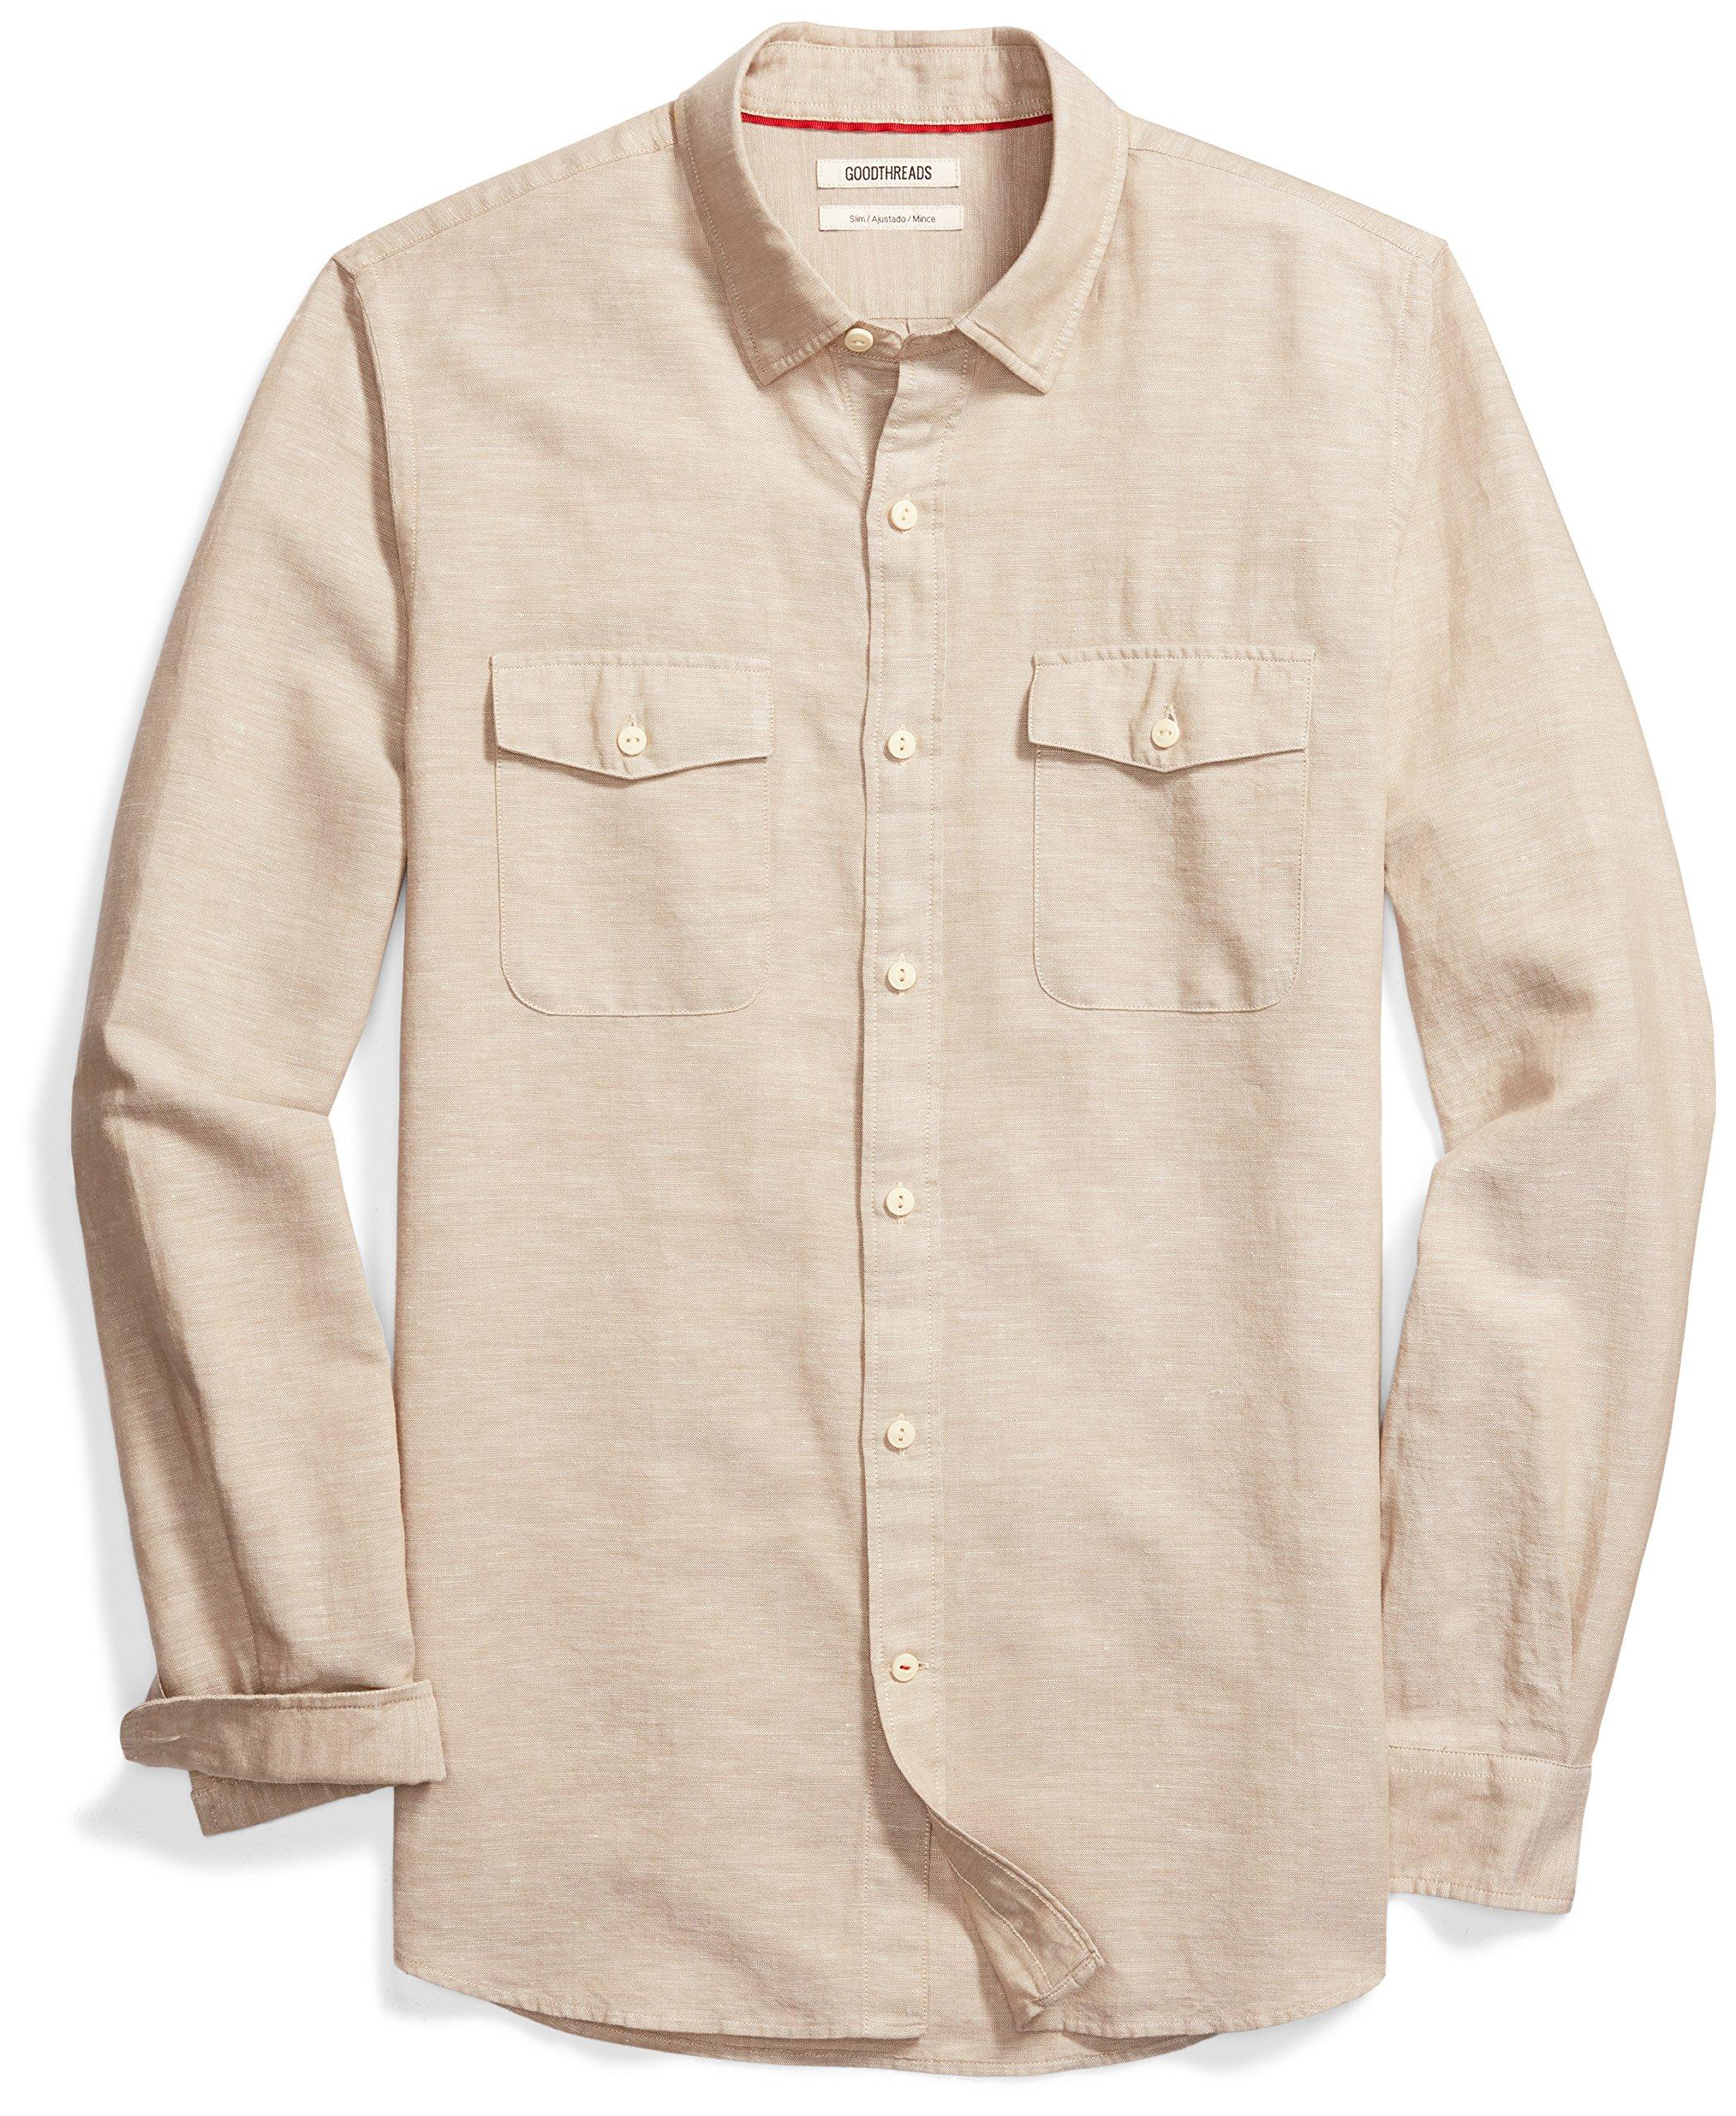 Goodthreads Men's Slim-Fit Long-Sleeve Linen and Cotton Blend Shirt, Khaki, Large